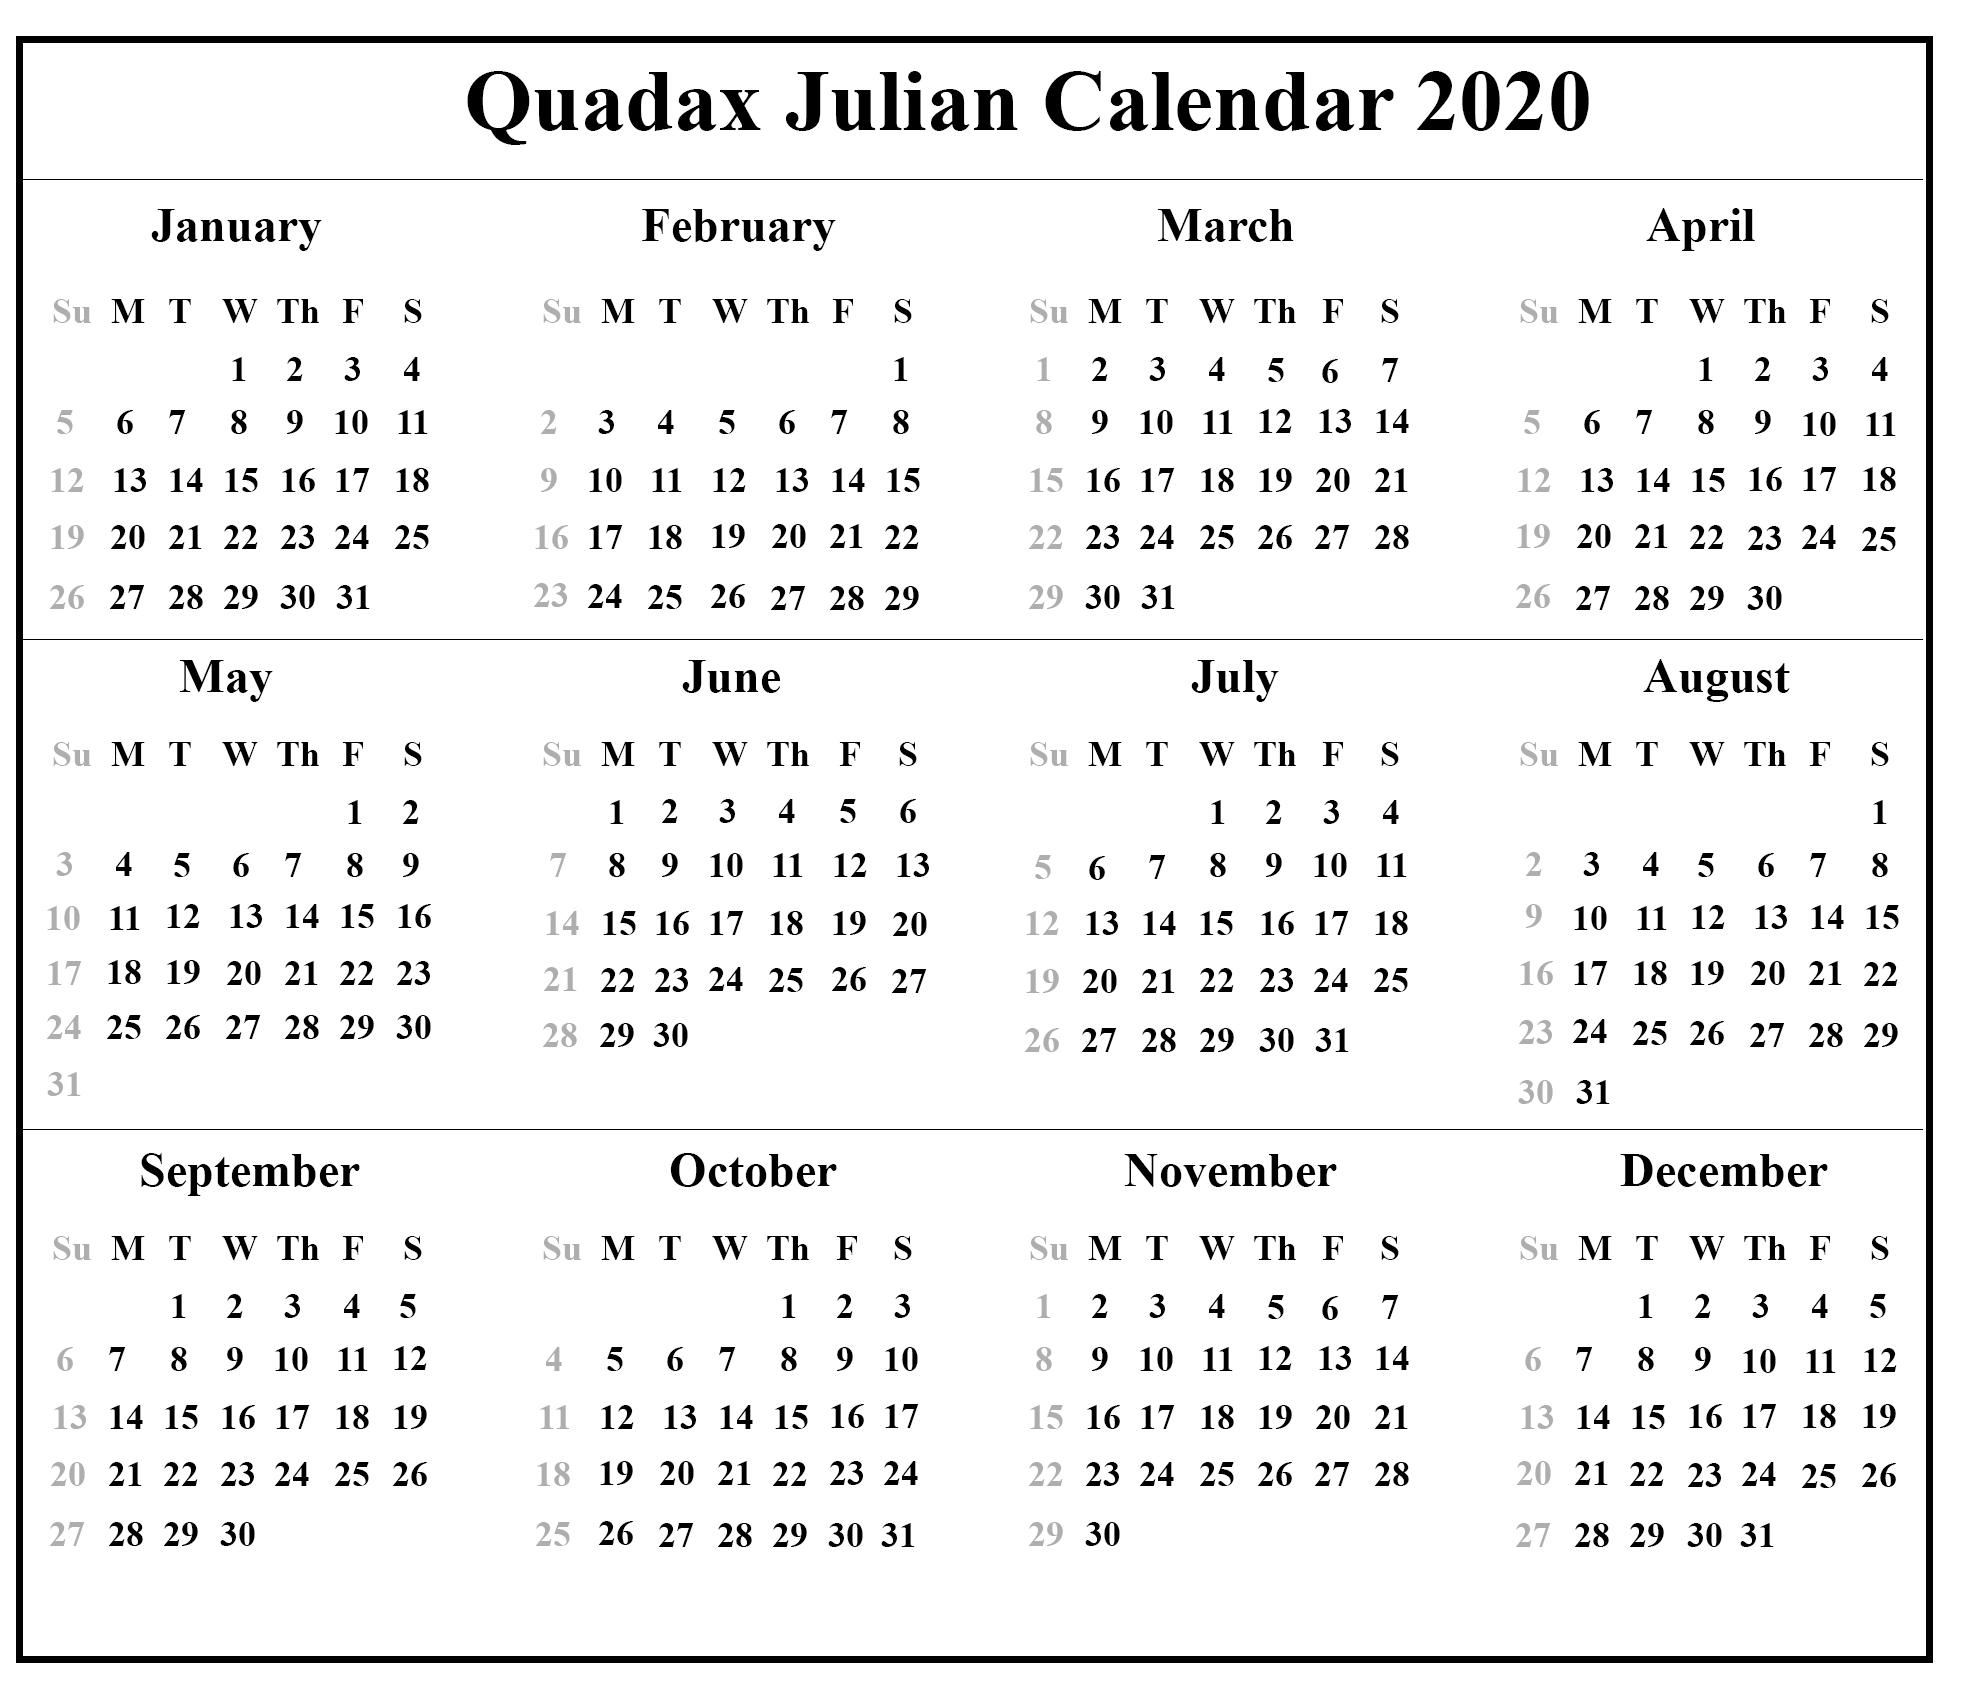 Julian Calendar 2020 Pdf Quadax | Example Calendar Printable regarding Julian Calendar 2020 Quadax